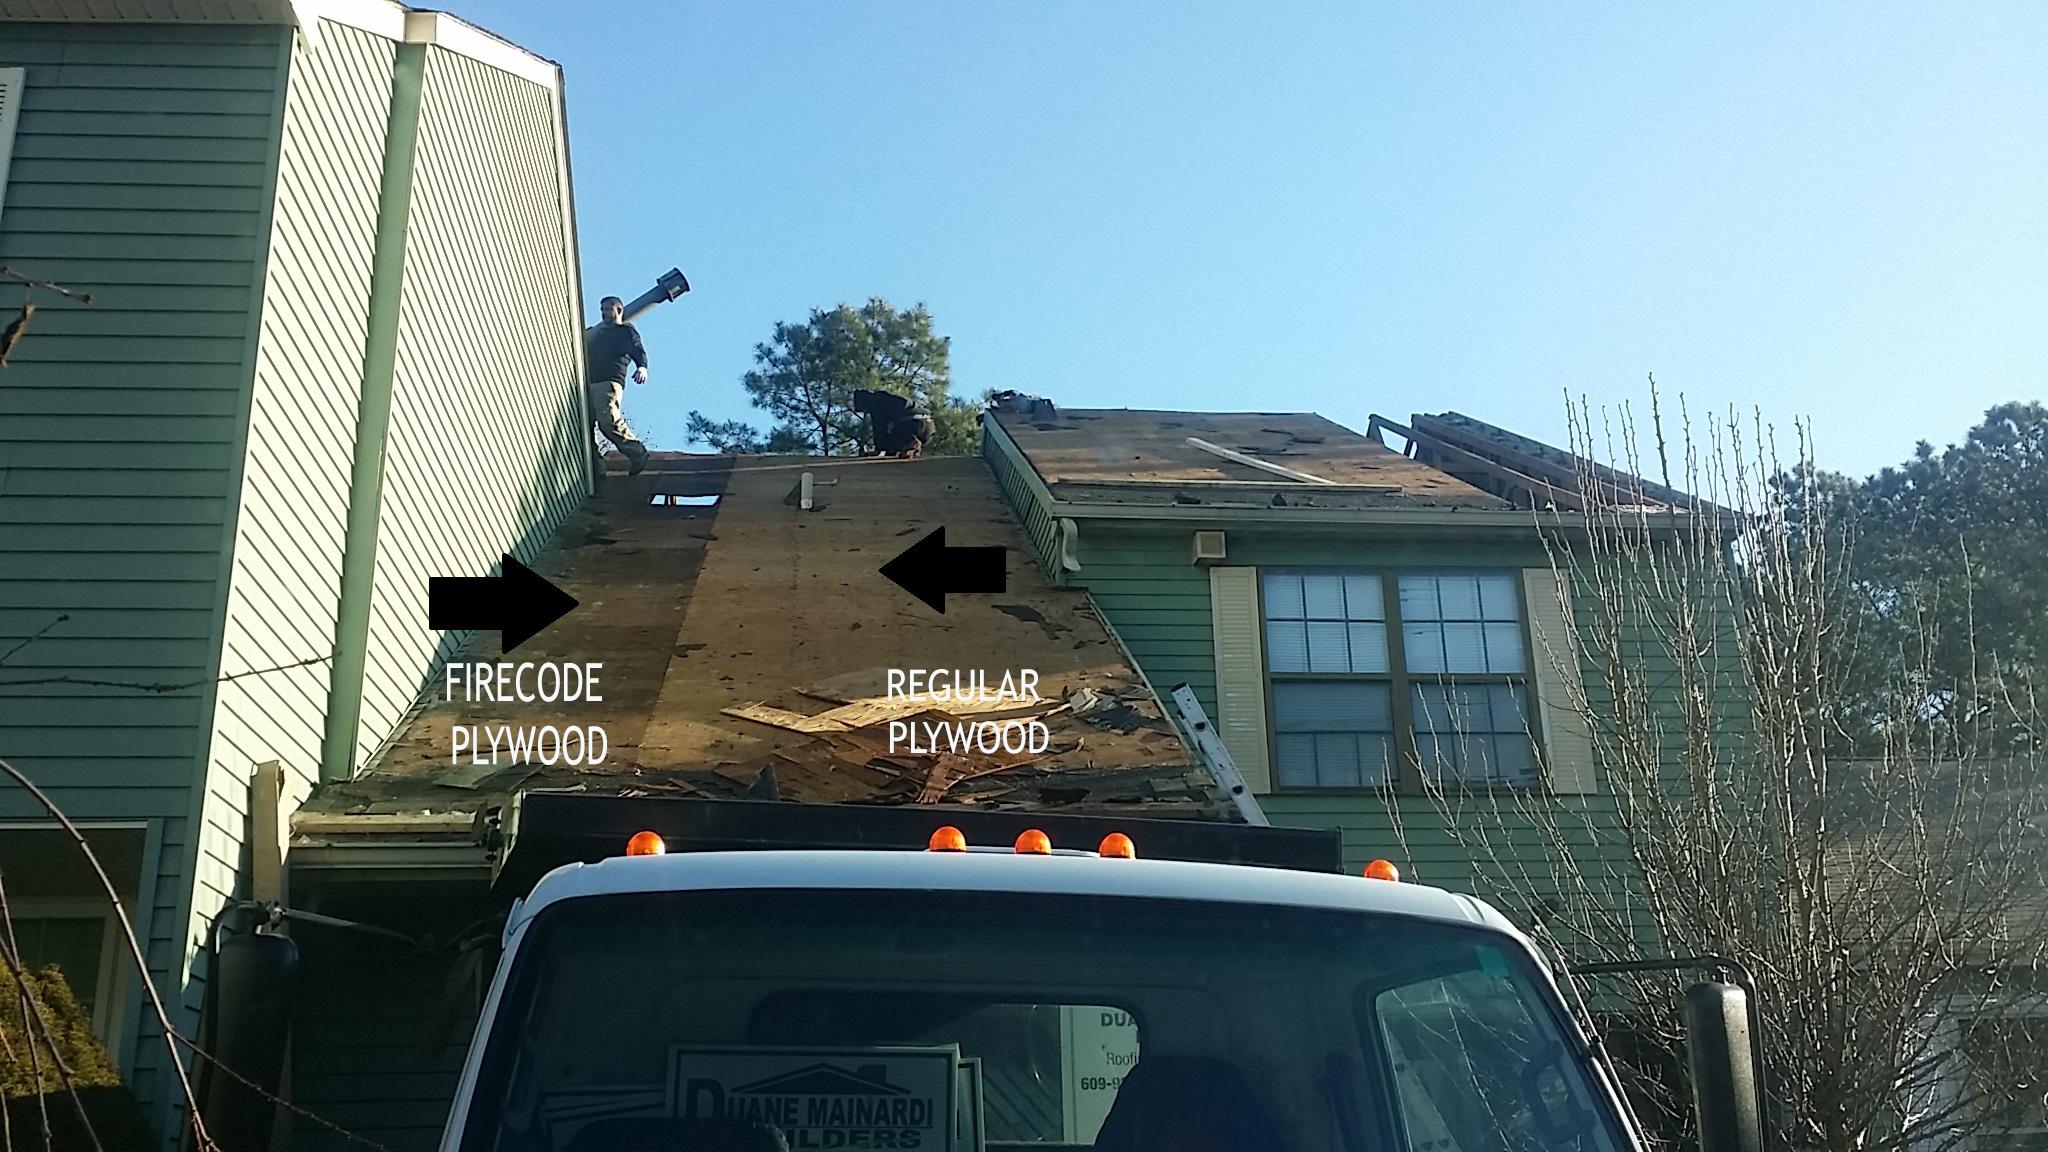 Firecode Plywood - Damaged